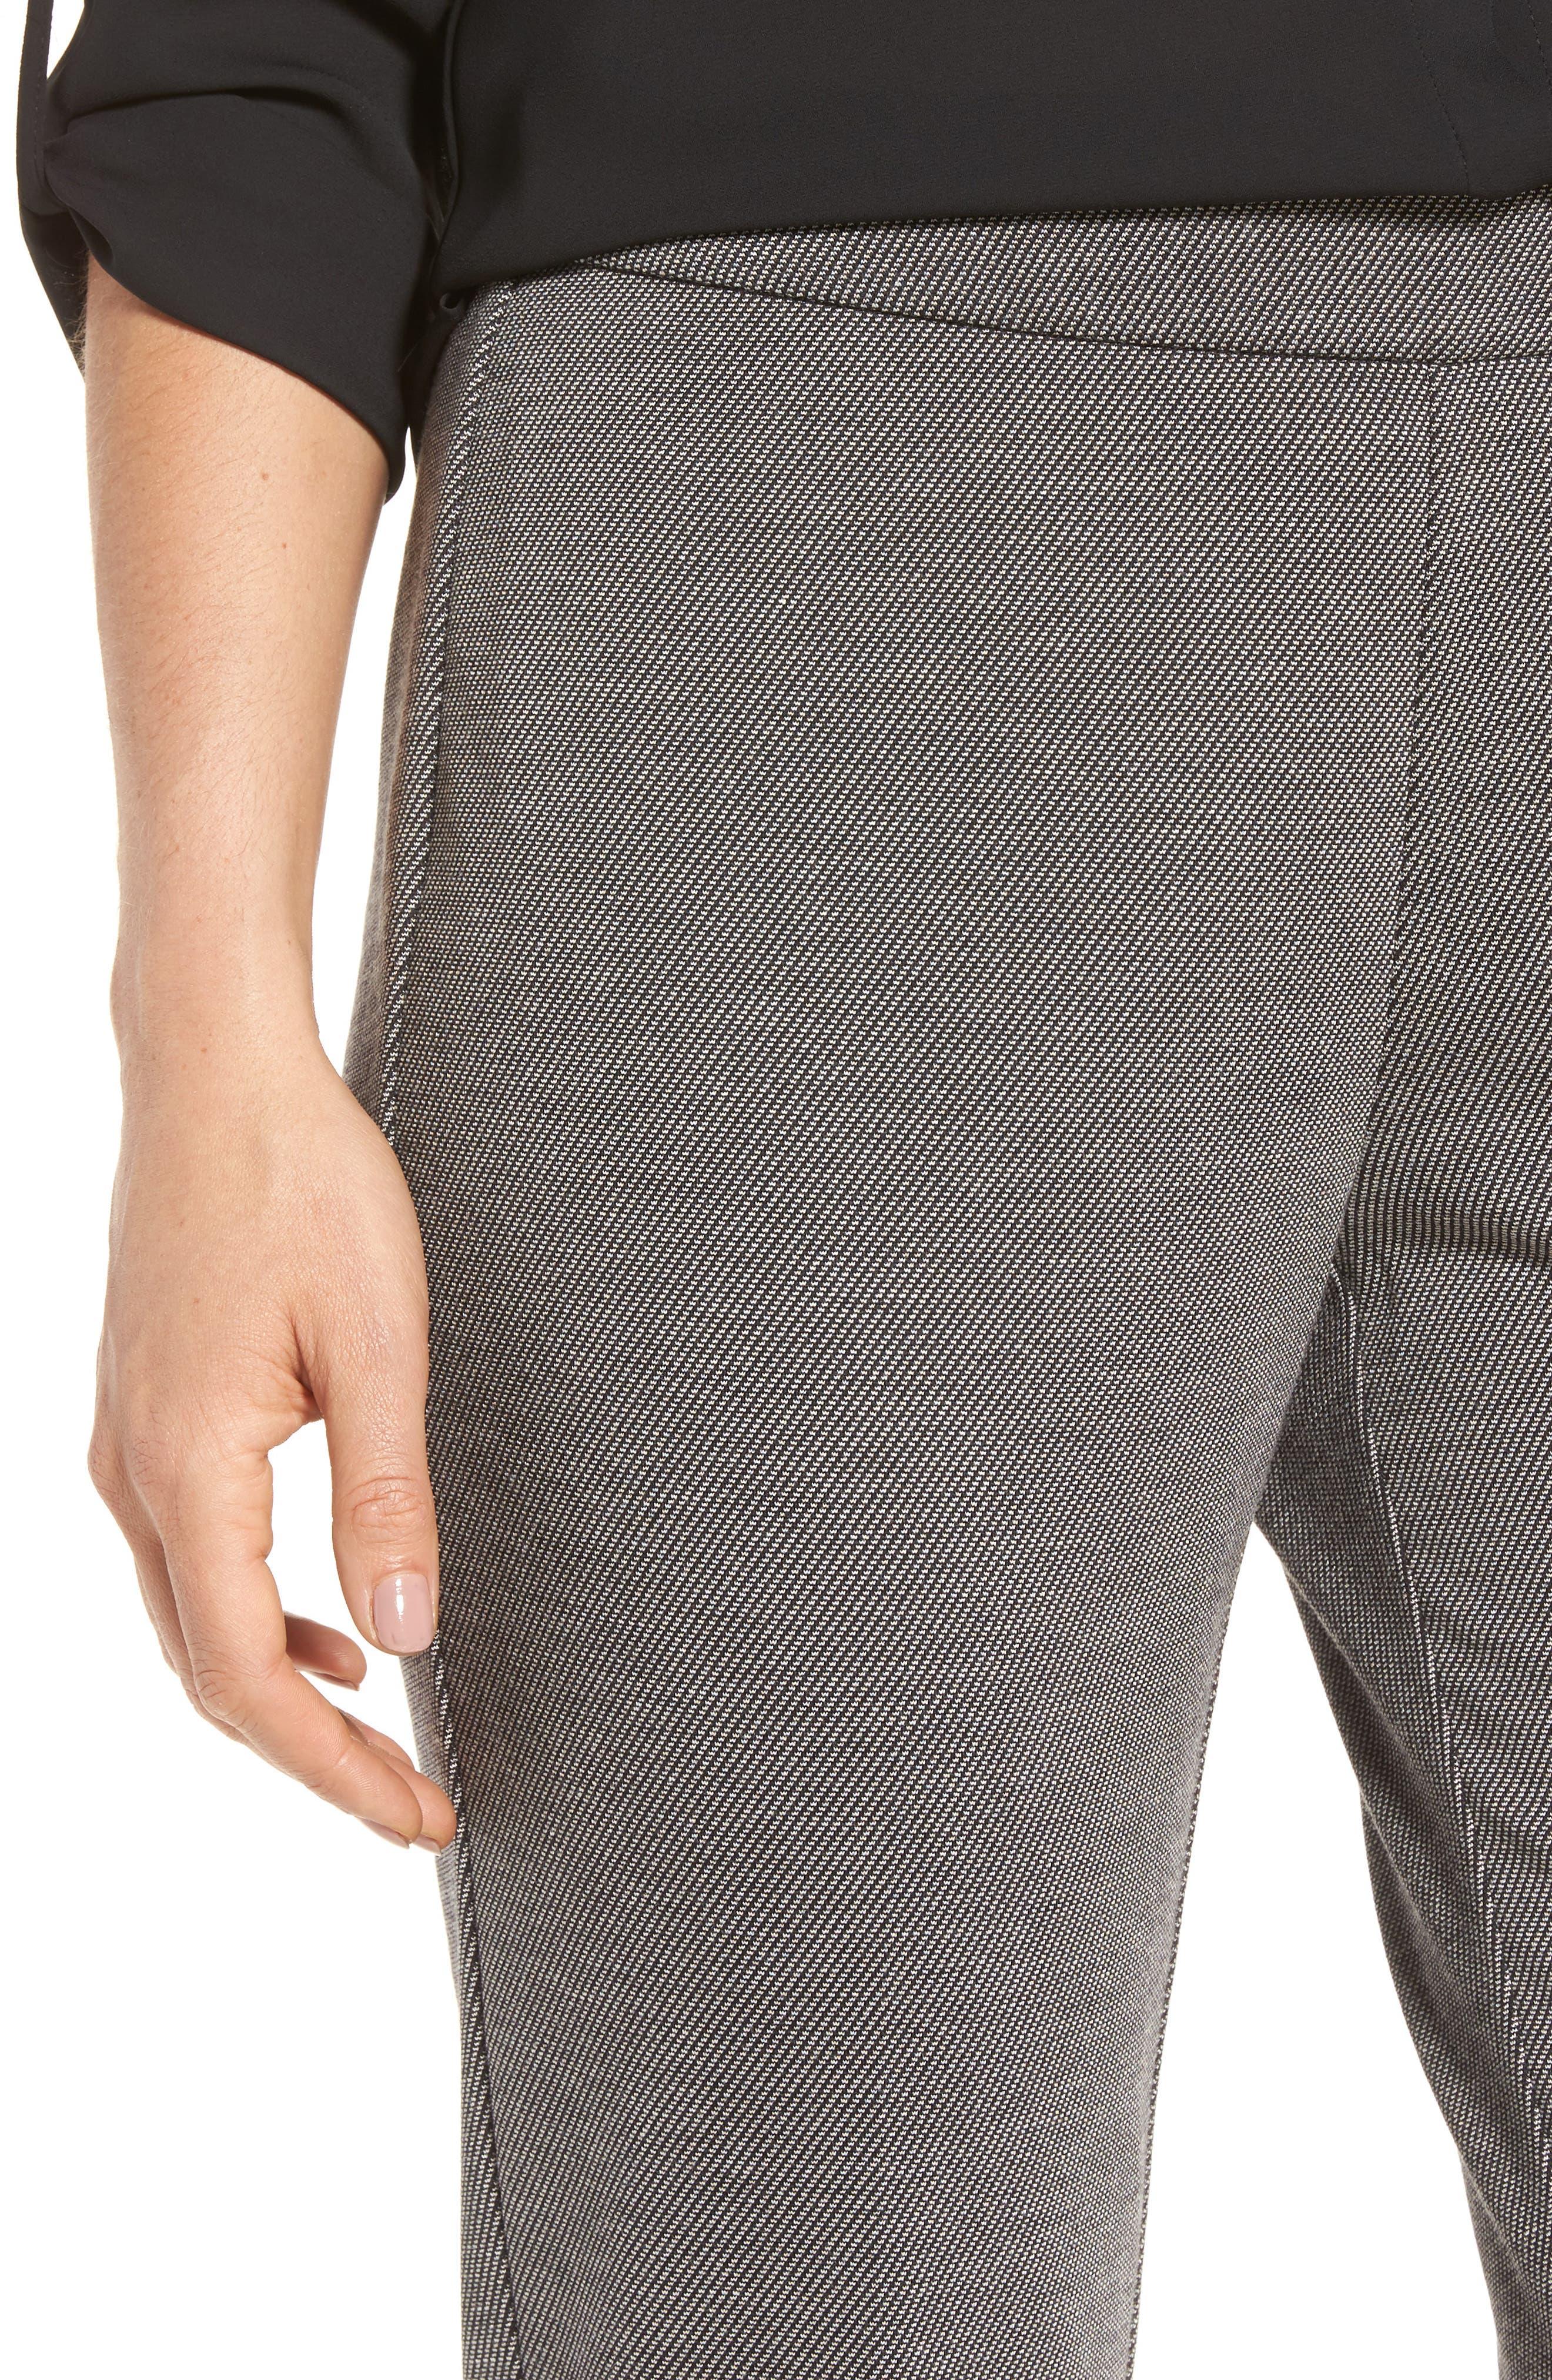 Slim Twill Ponte Knit Pants,                             Alternate thumbnail 4, color,                             020